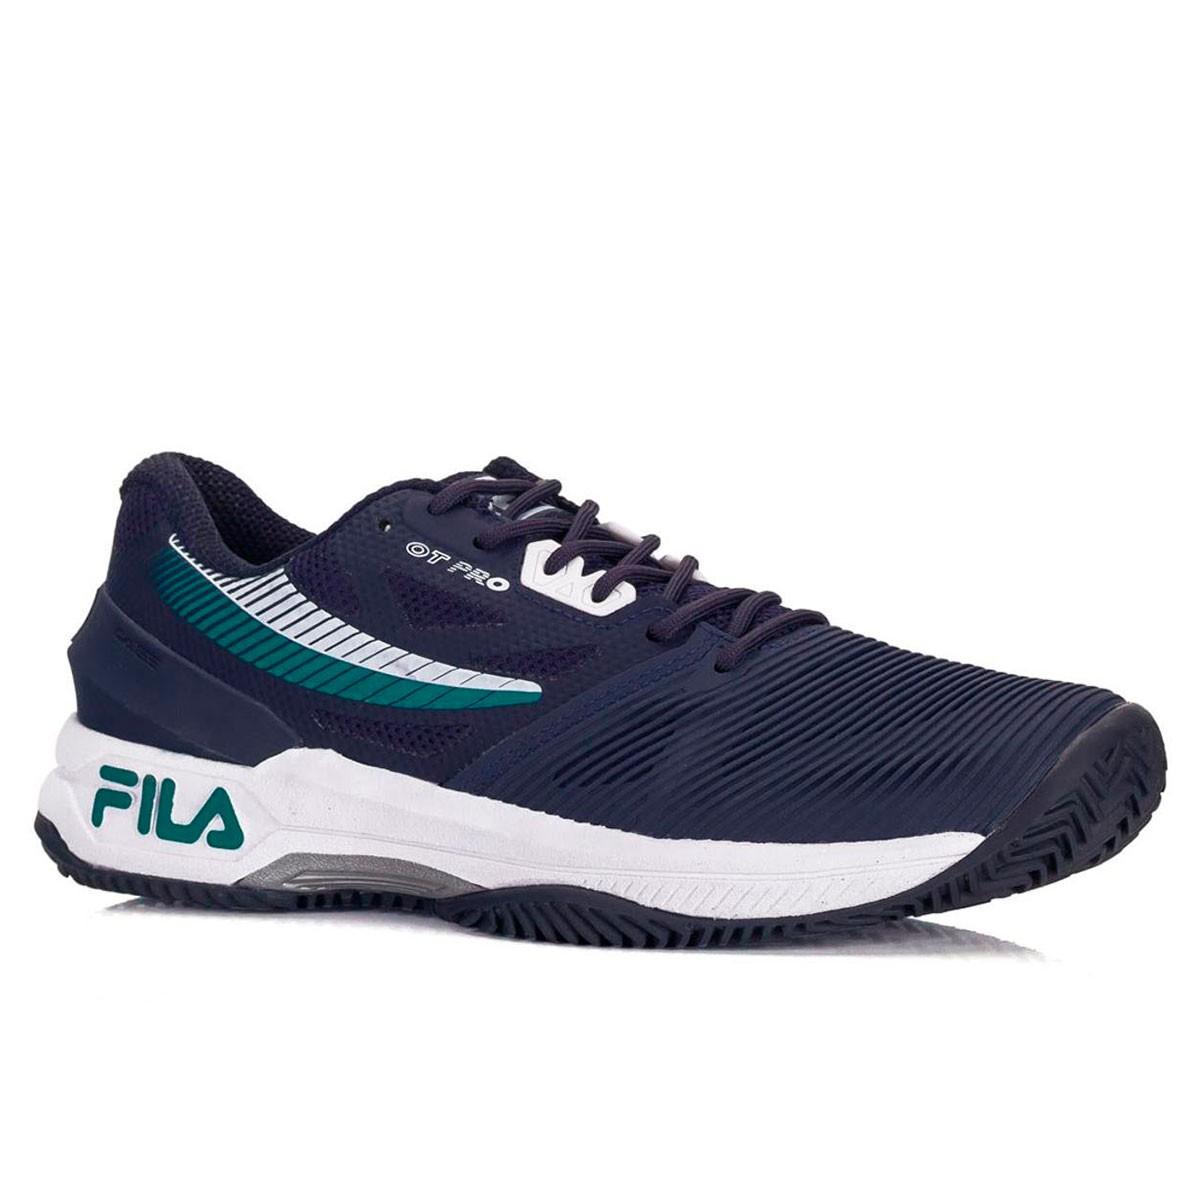 Tênis Fila OT Pro Clay Masculino Azul